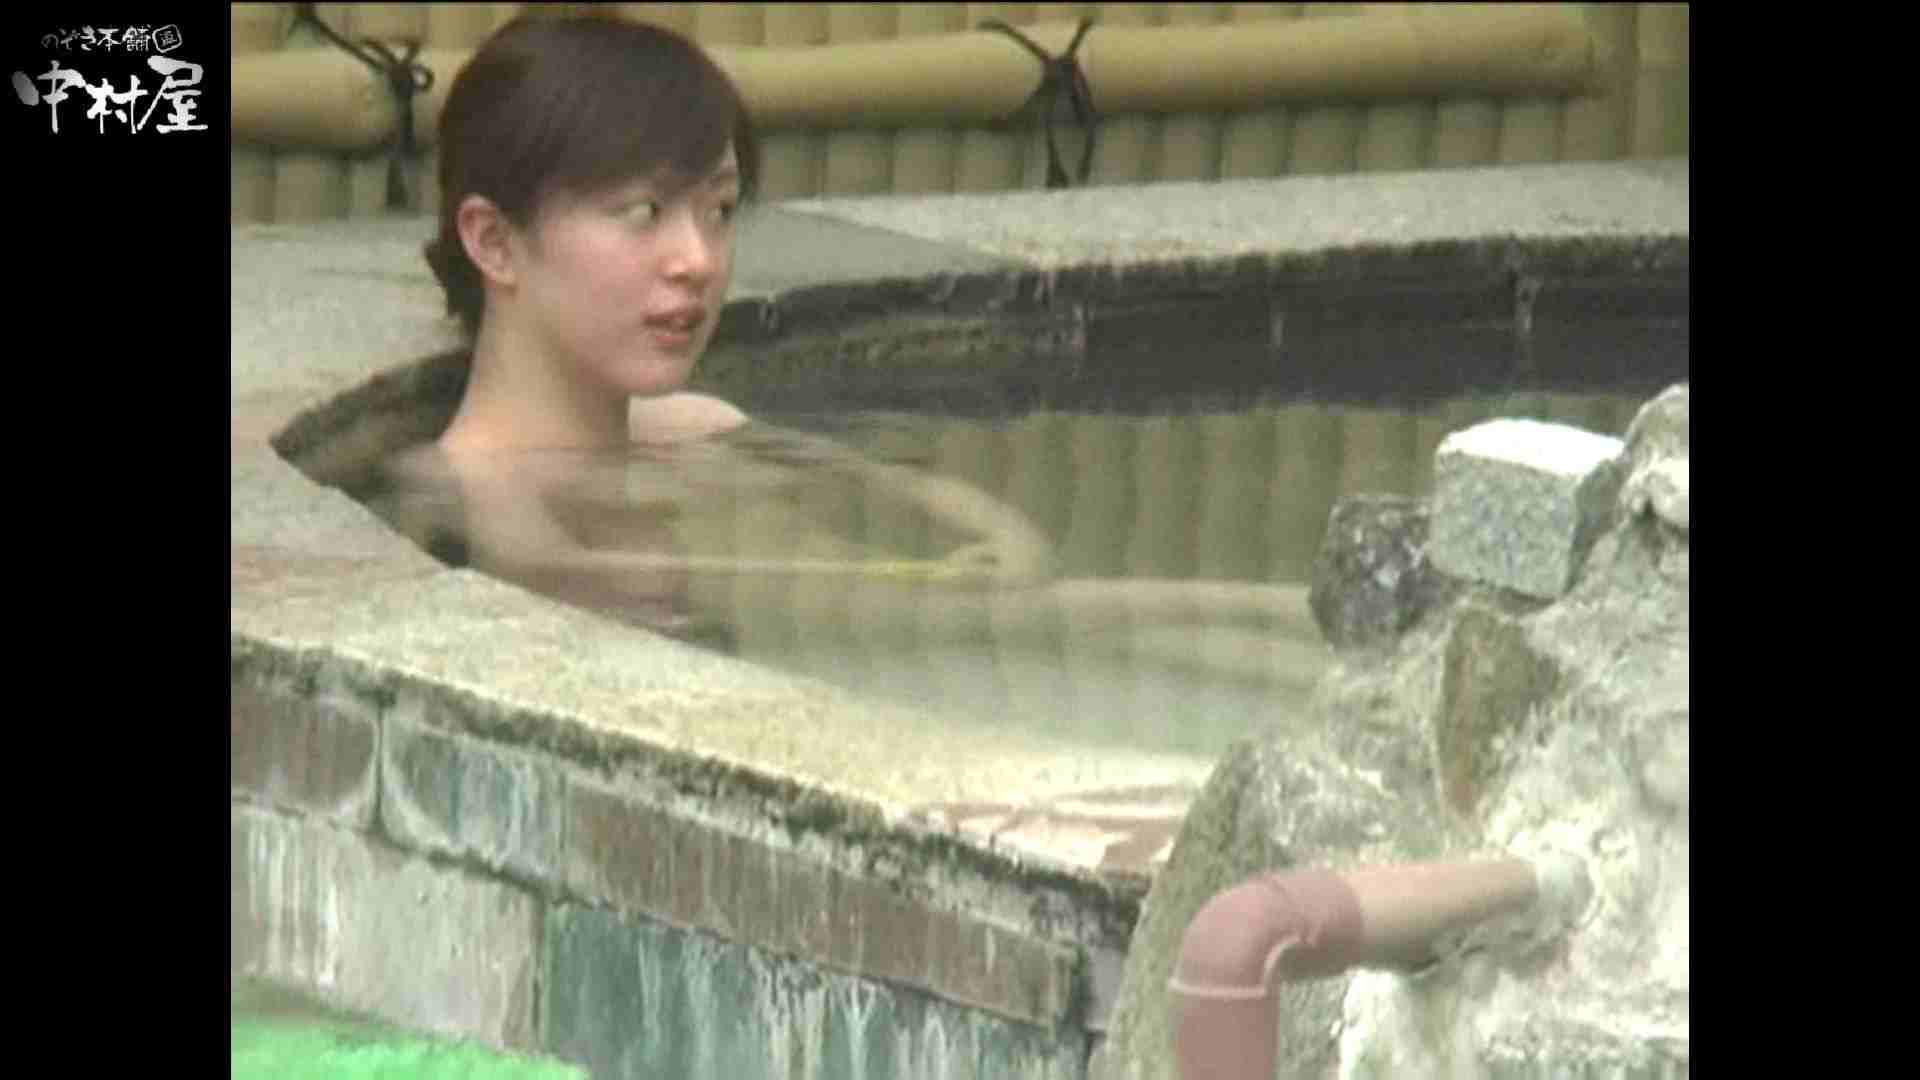 Aquaな露天風呂Vol.875潜入盗撮露天風呂十一判湯 其の一 盗撮師作品  96pic 4